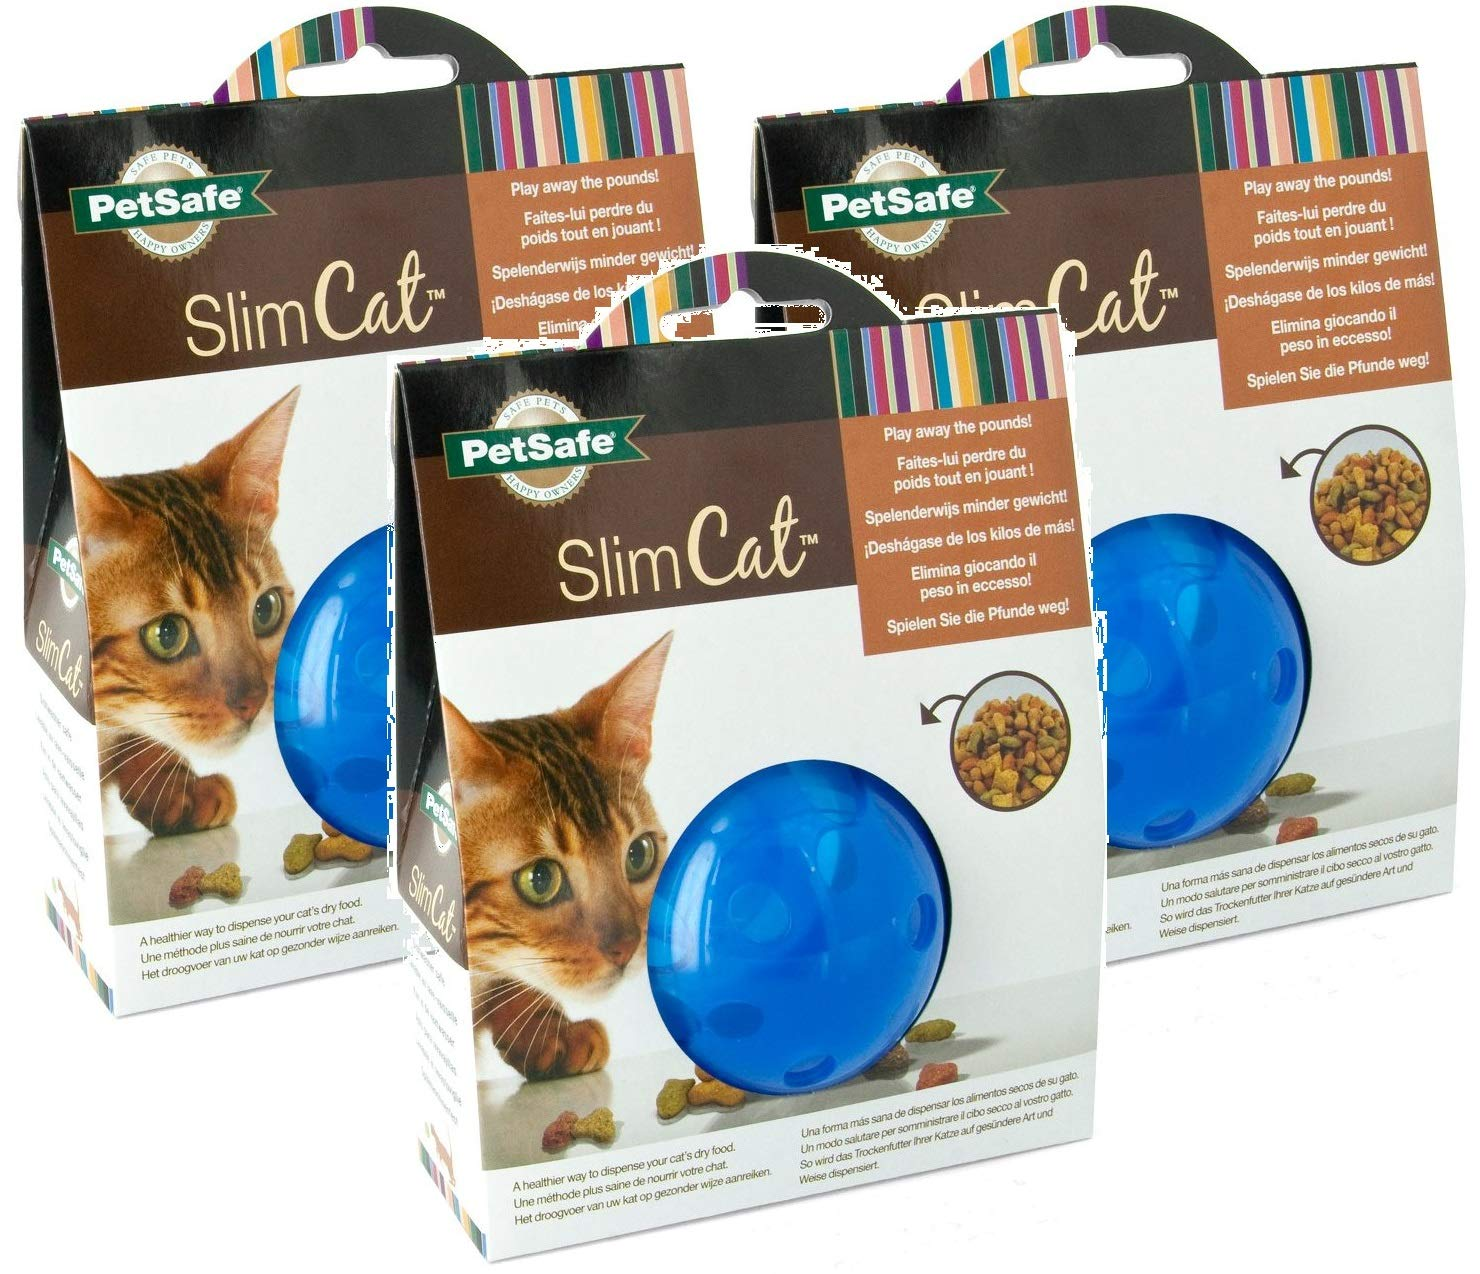 Petsafe SlimCat Meal Dispensing Cat Toy, Blue (3 Pack) by PetSafe